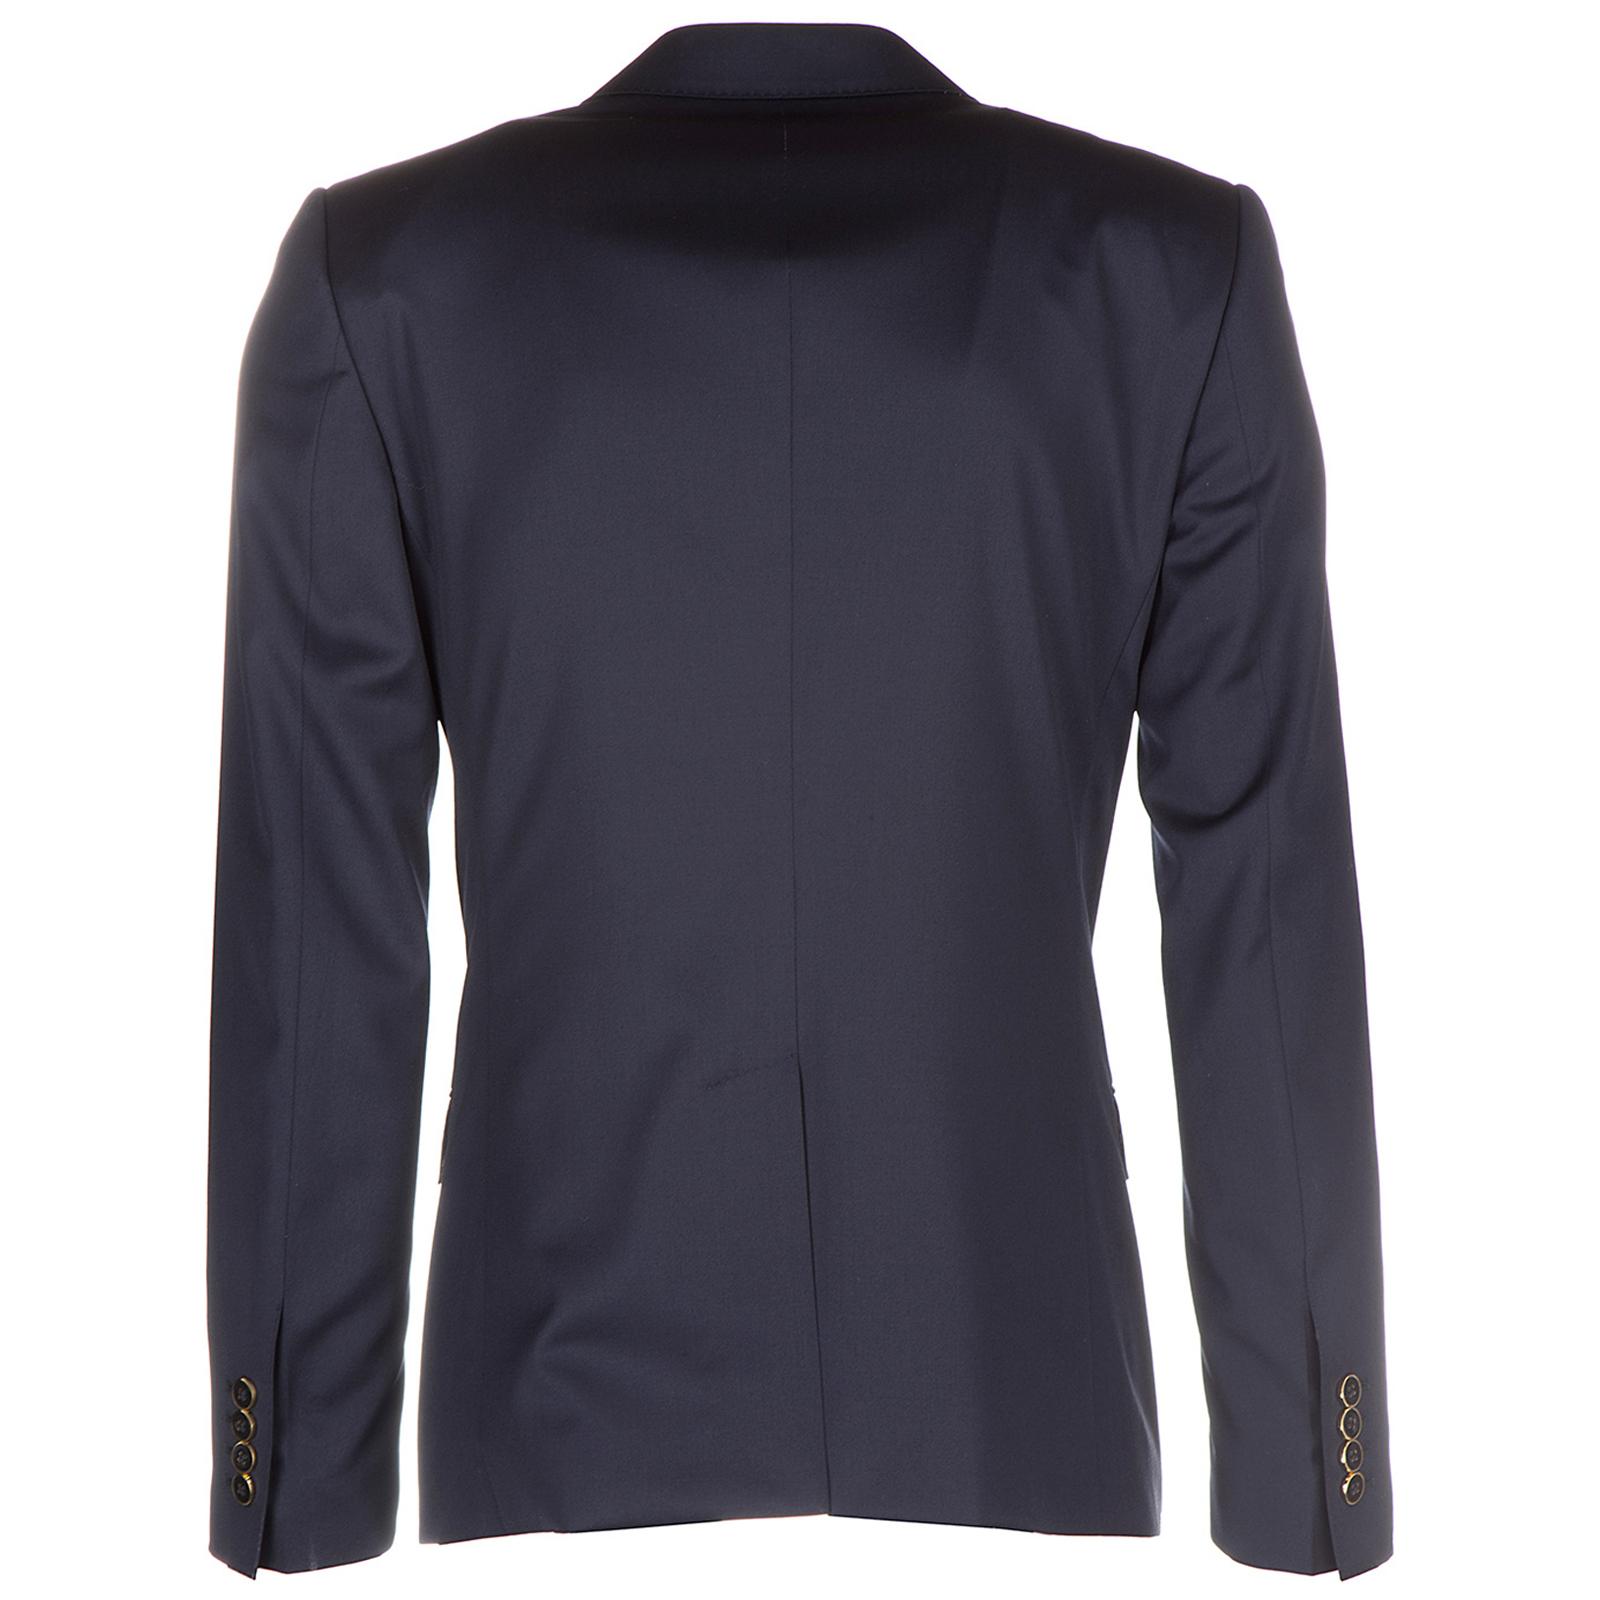 Men's wool jacket blazer